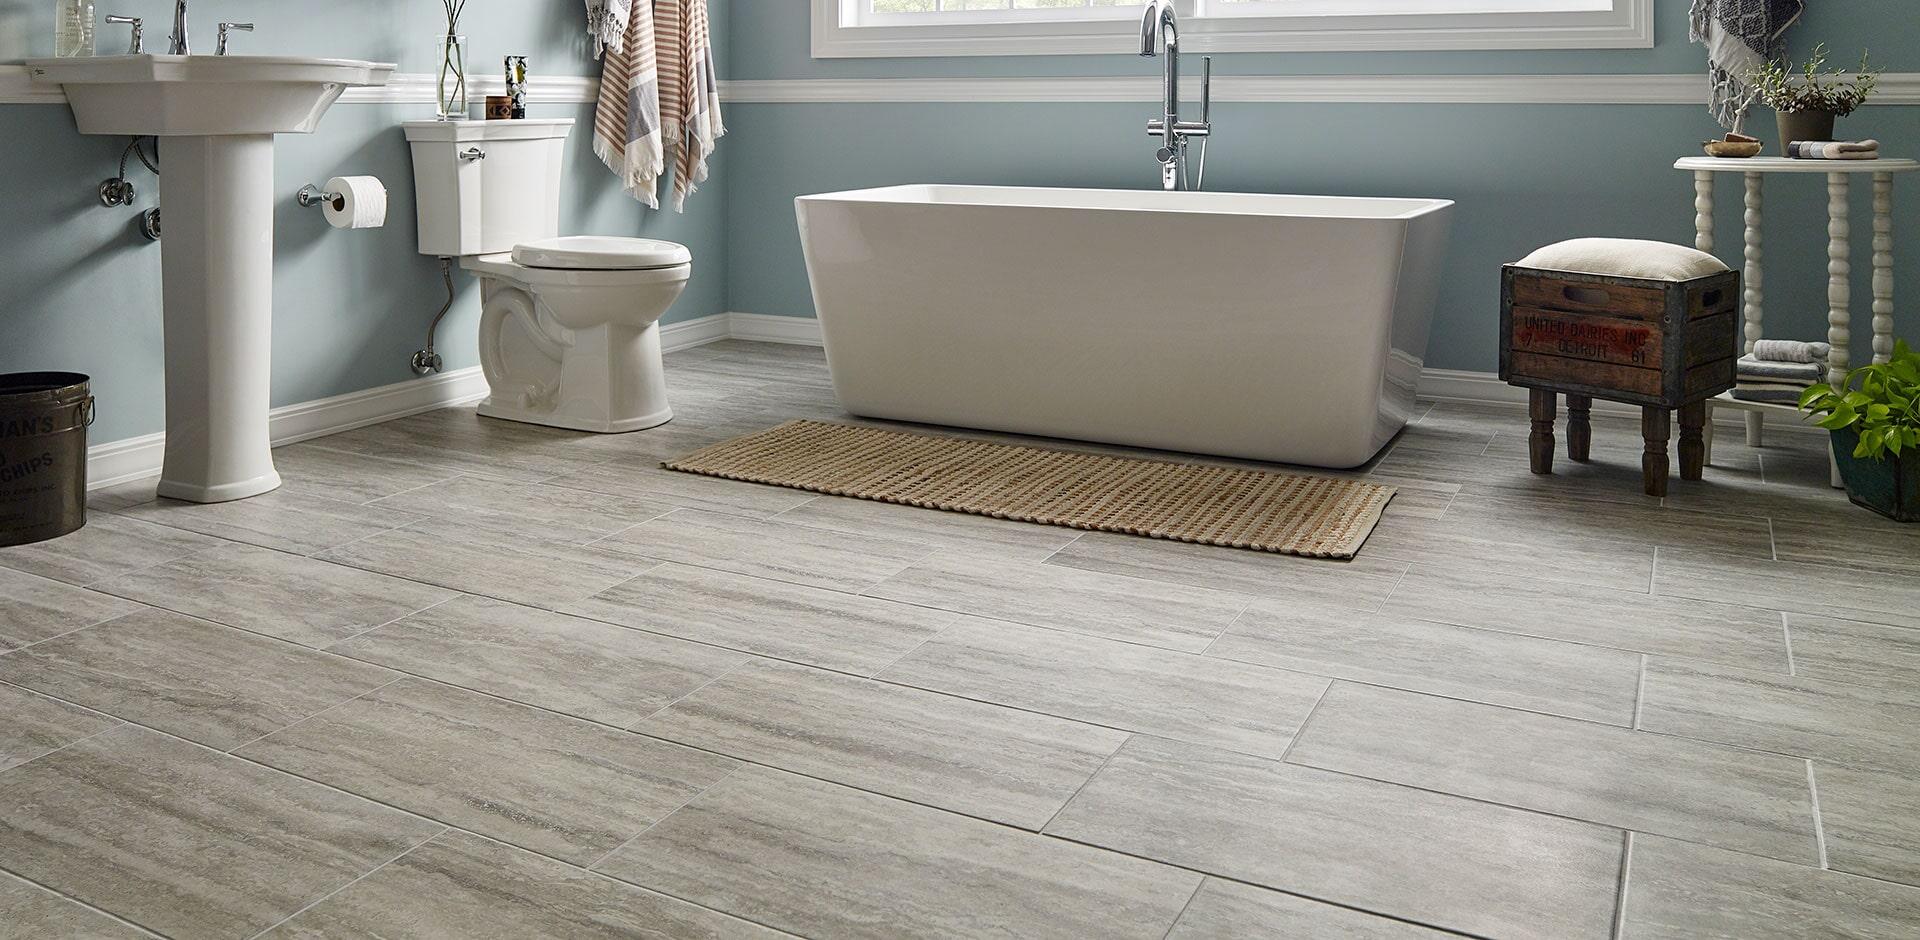 veneto gray bathroom flooring design